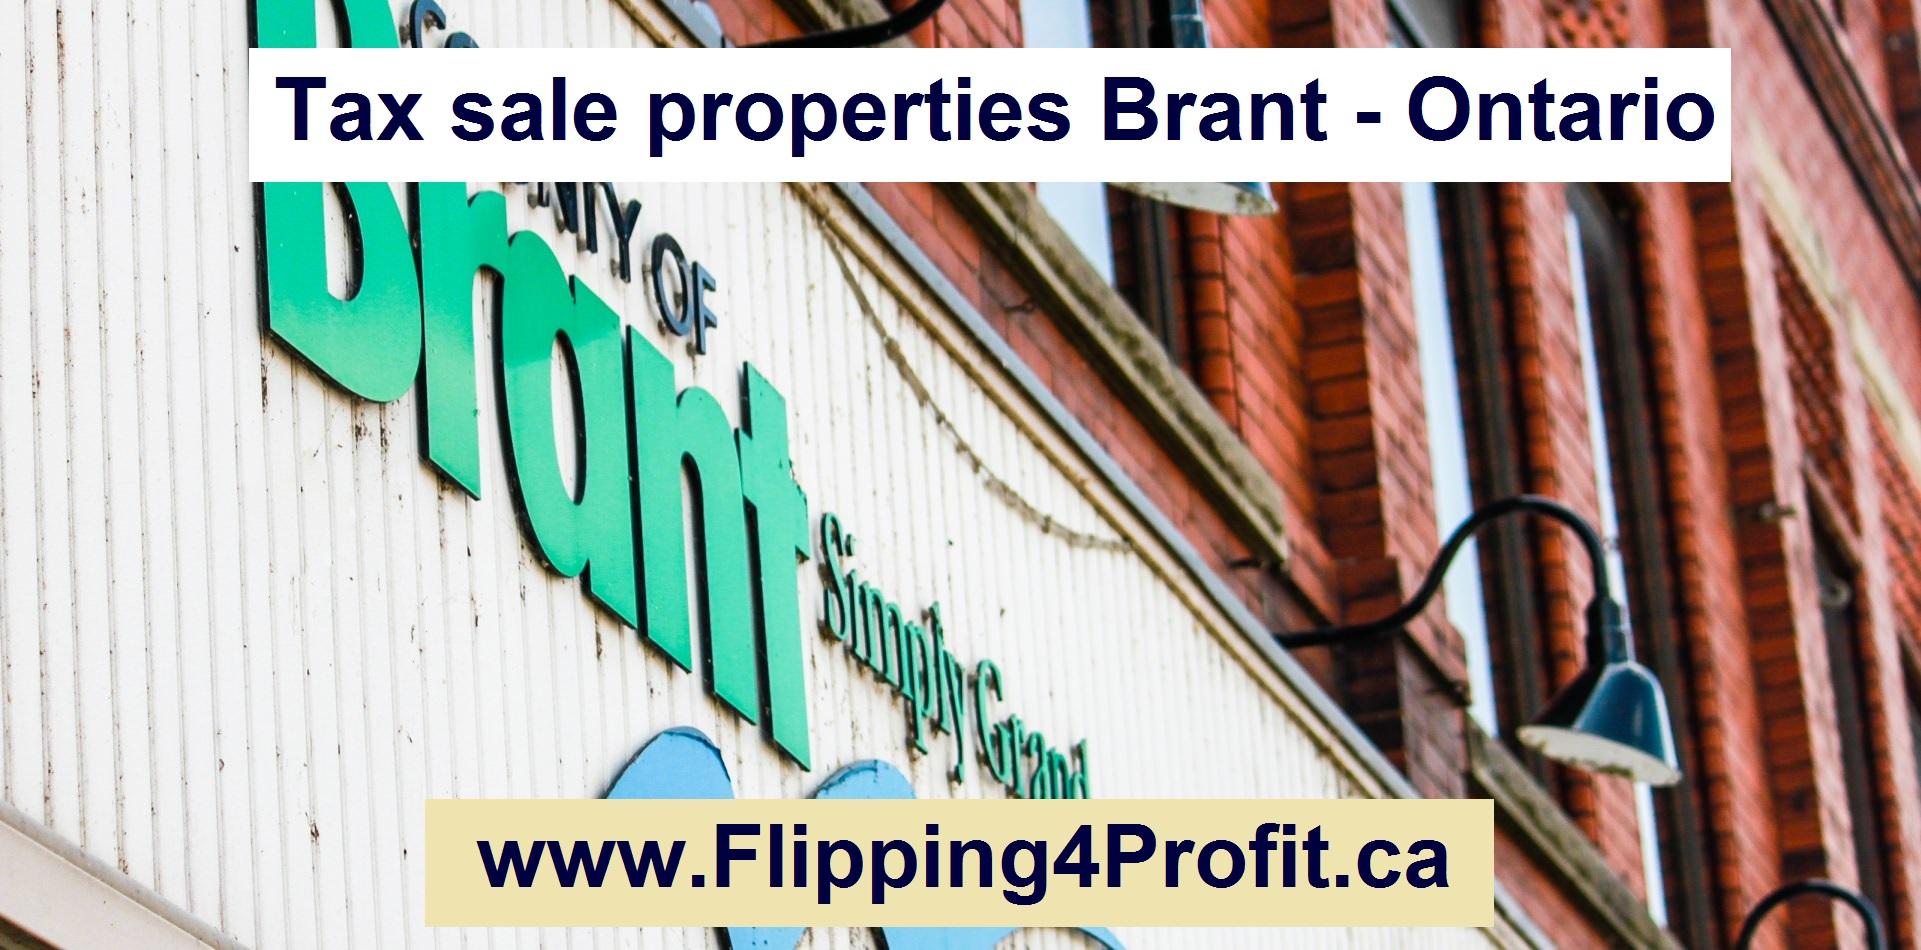 Tax sale properties Brant - Ontario